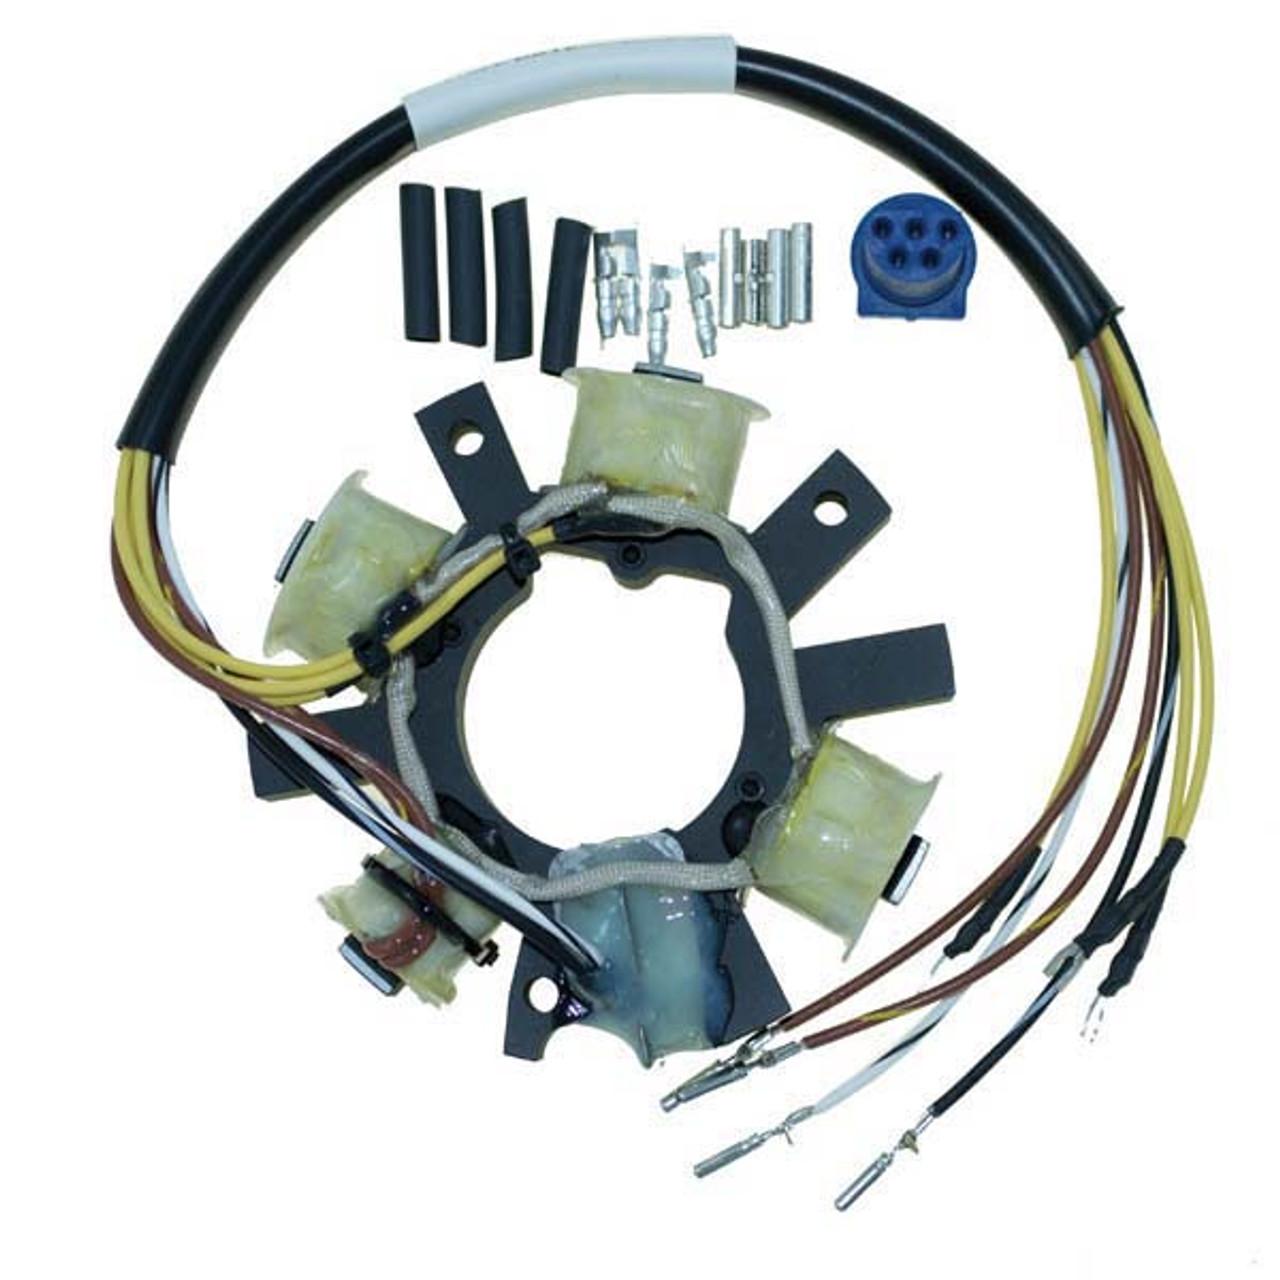 Johnson//Evinrude 9.9-15 HP 4 Stroke Stator 173-4954